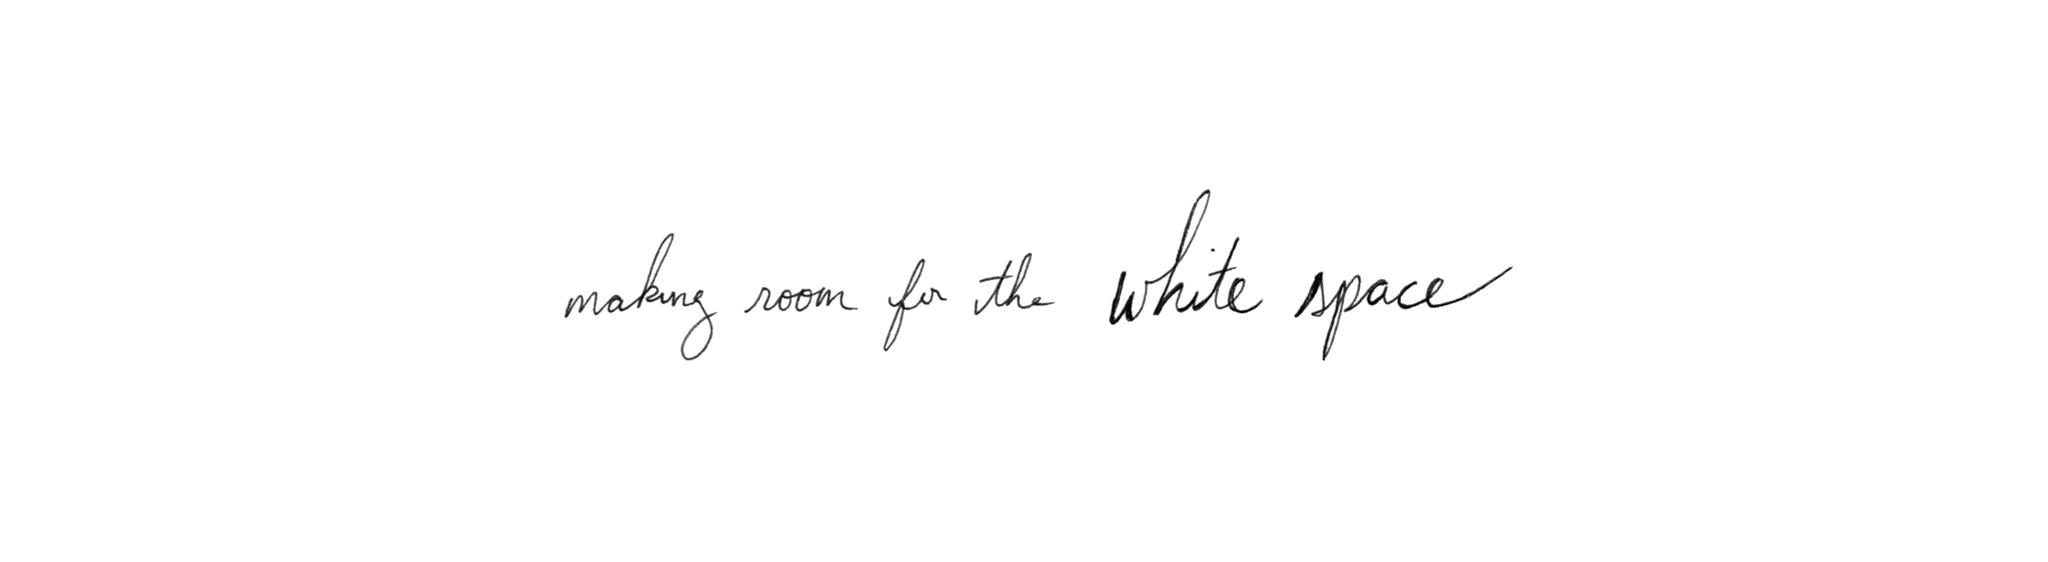 whitespace11